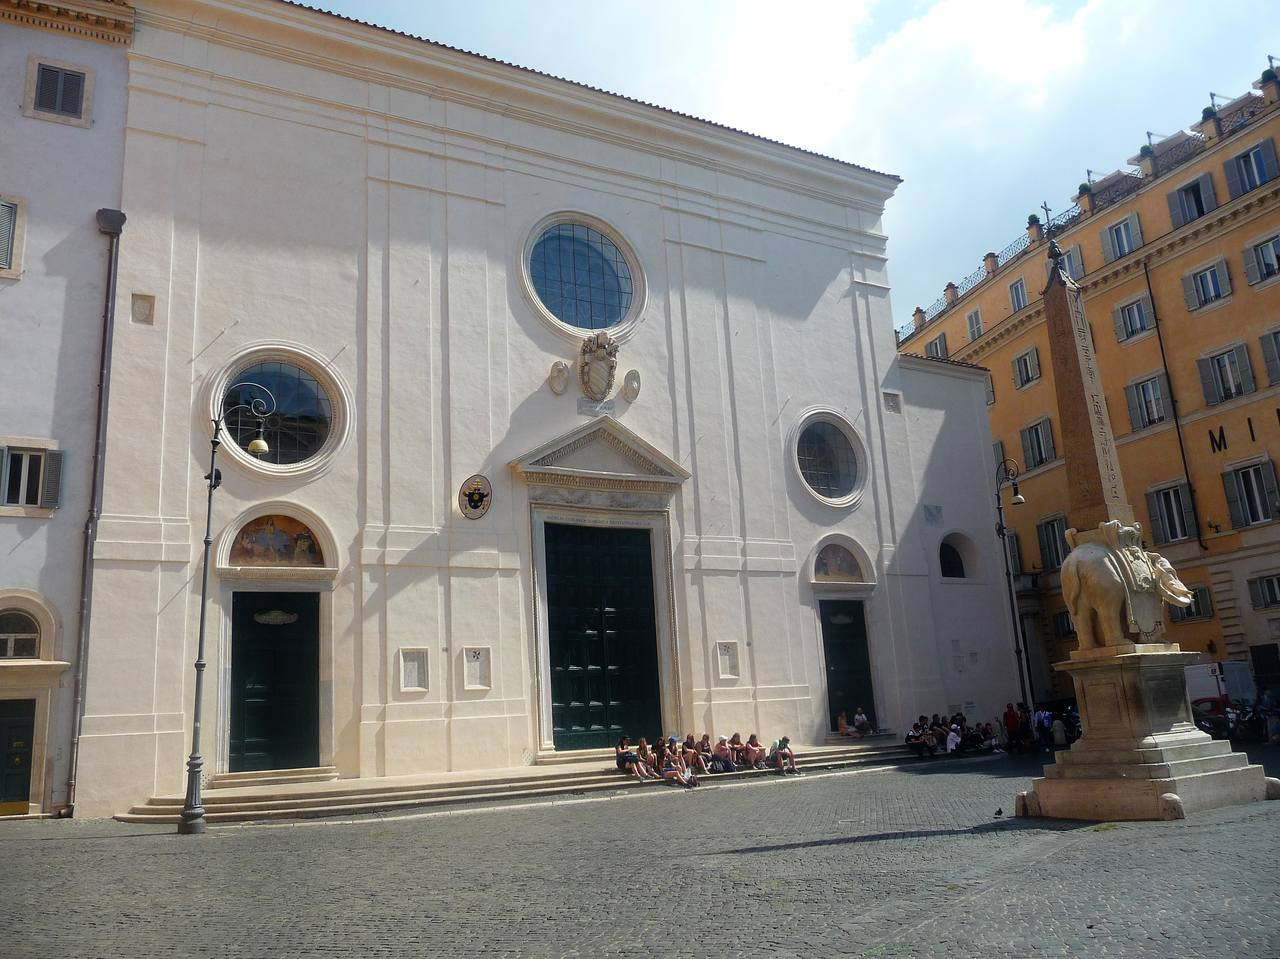 Santa Maria sopra Minerva (14)